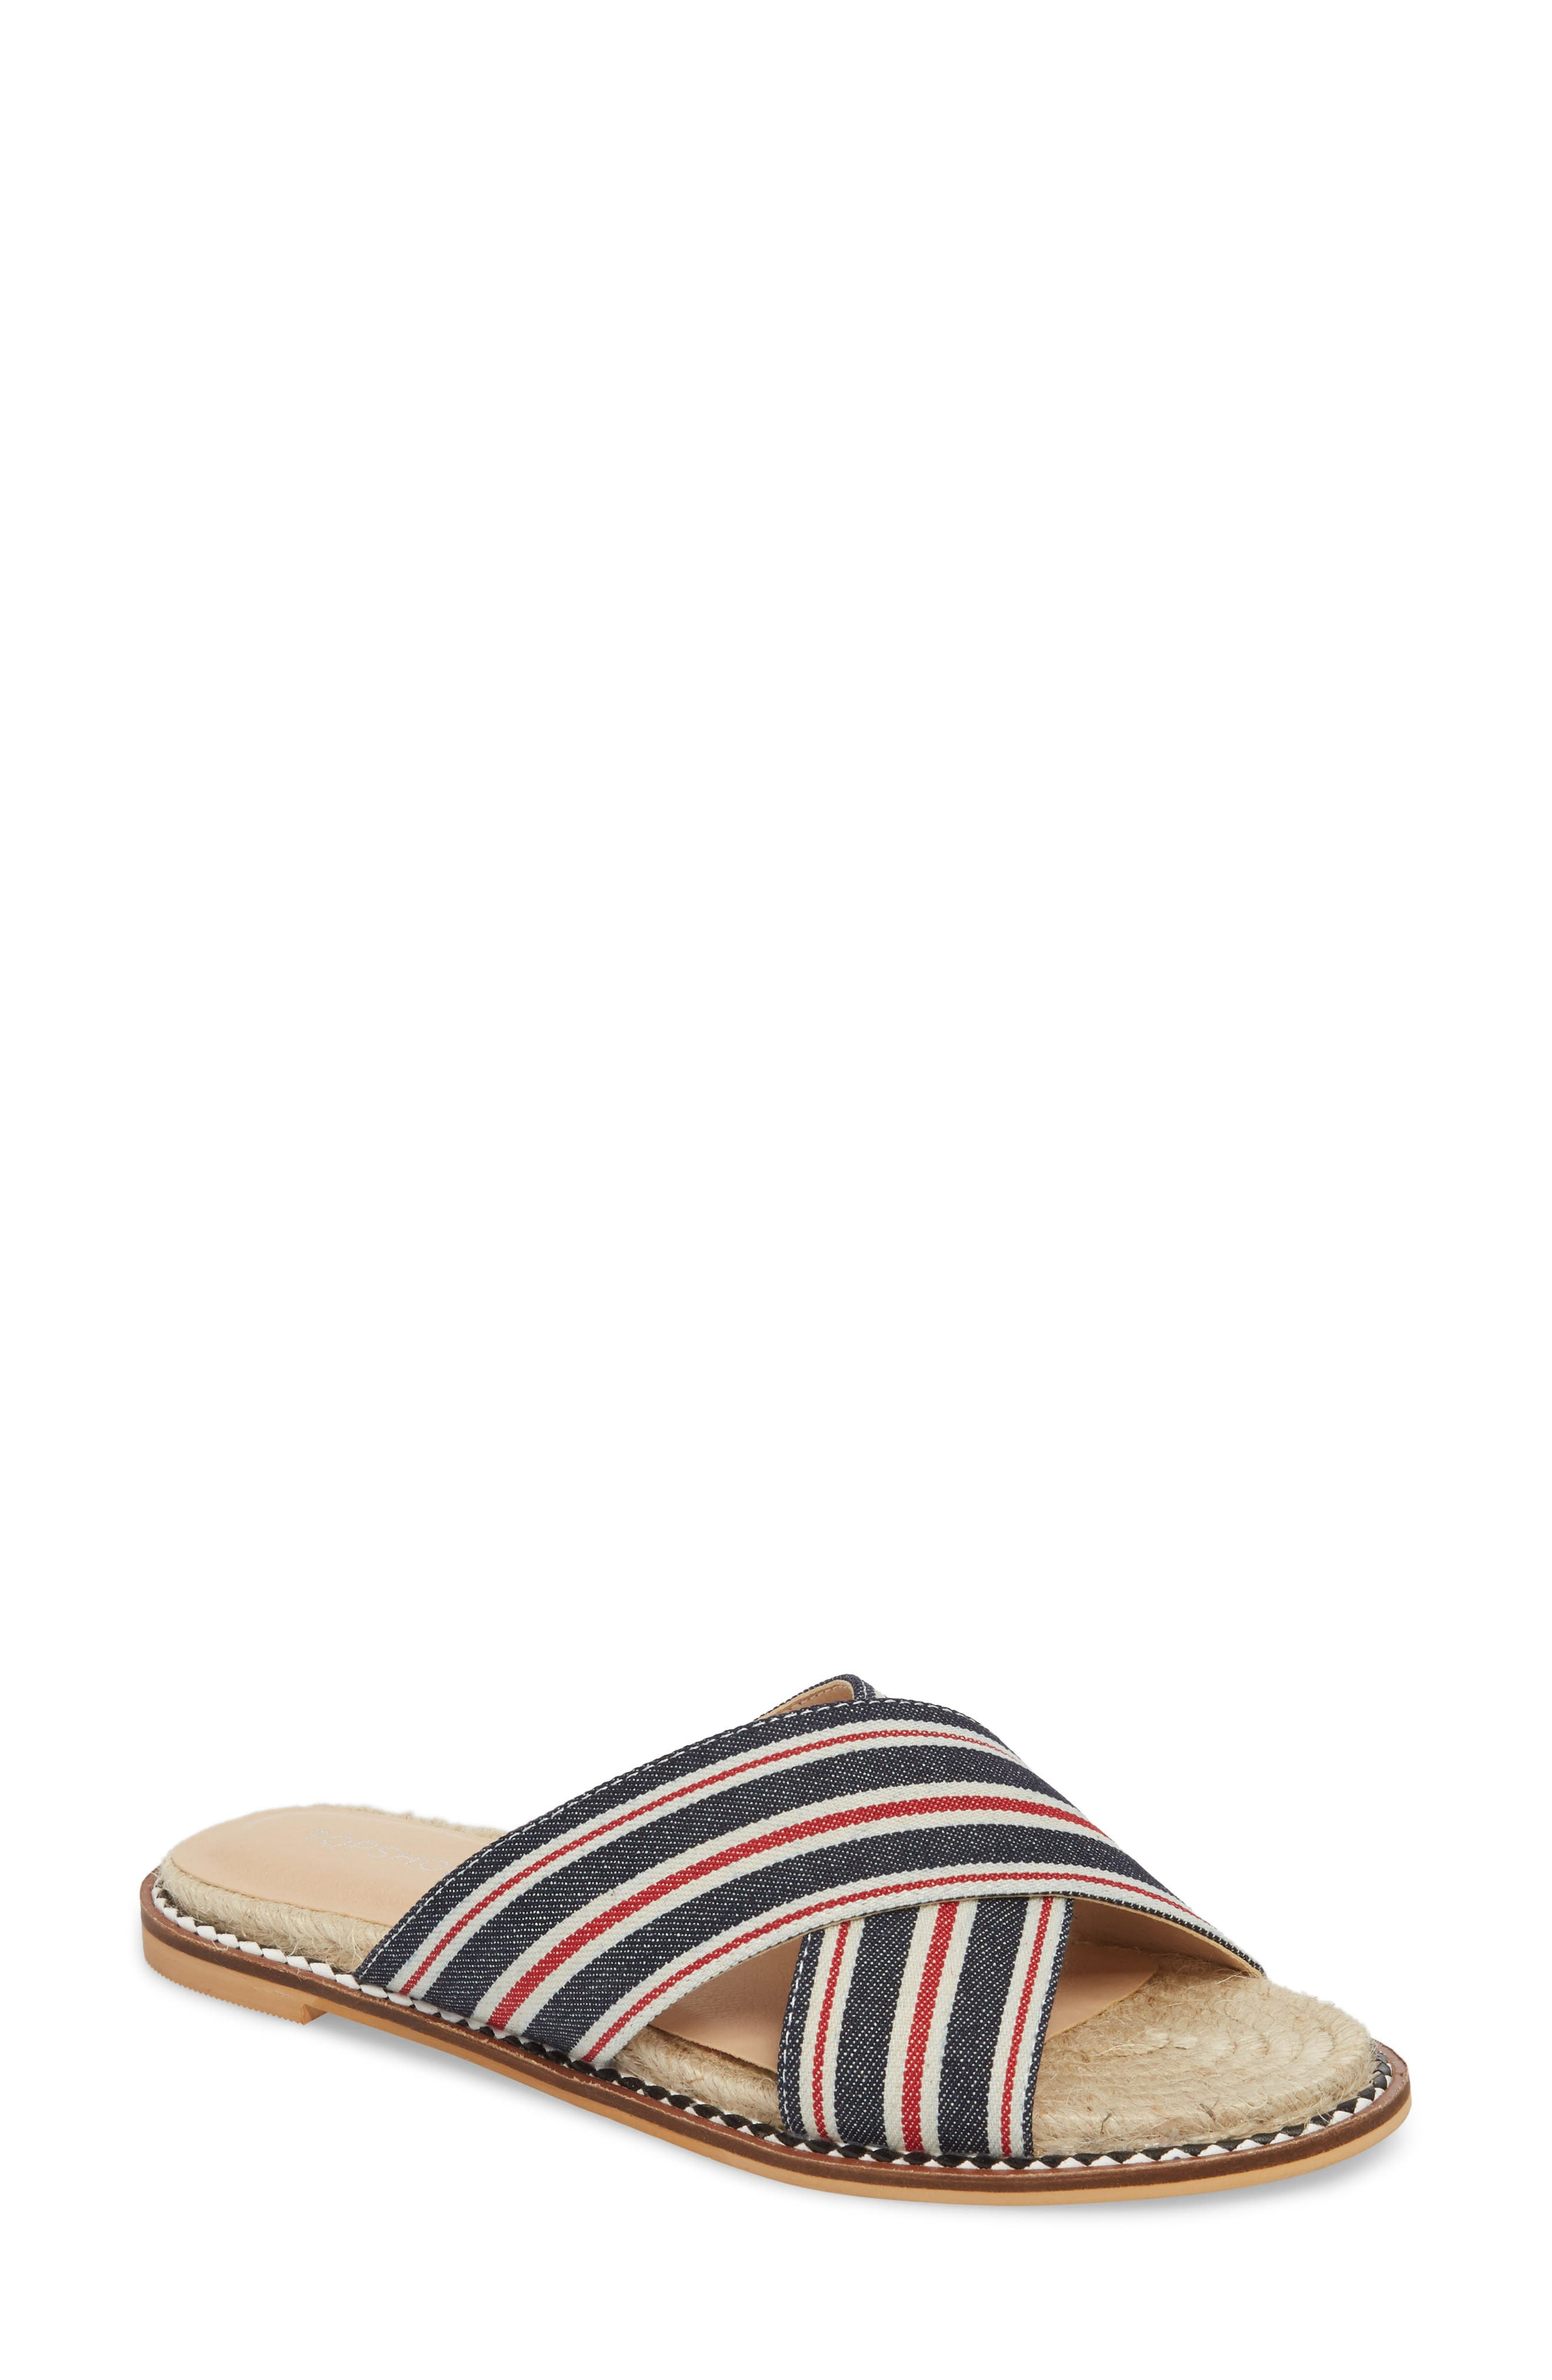 Hibiscus Slide Sandal,                         Main,                         color, Navy Blue Multi